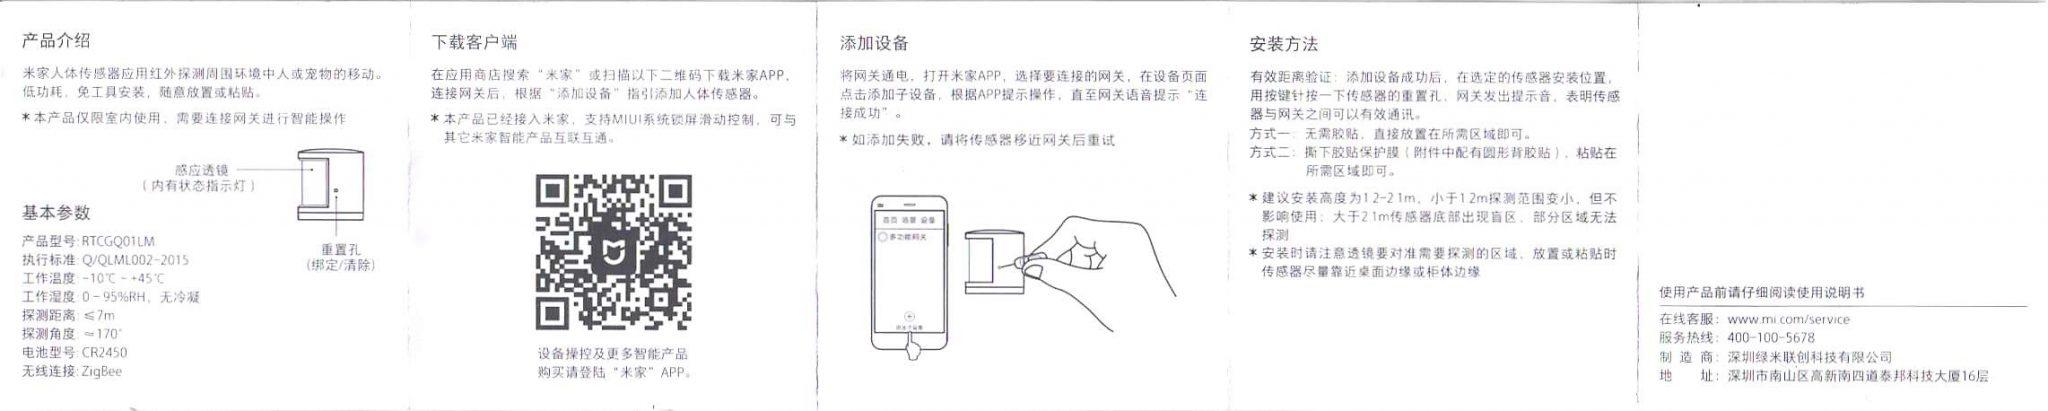 Xiaomi mijia スマートホームセキュリティキット 取説 人感センサー